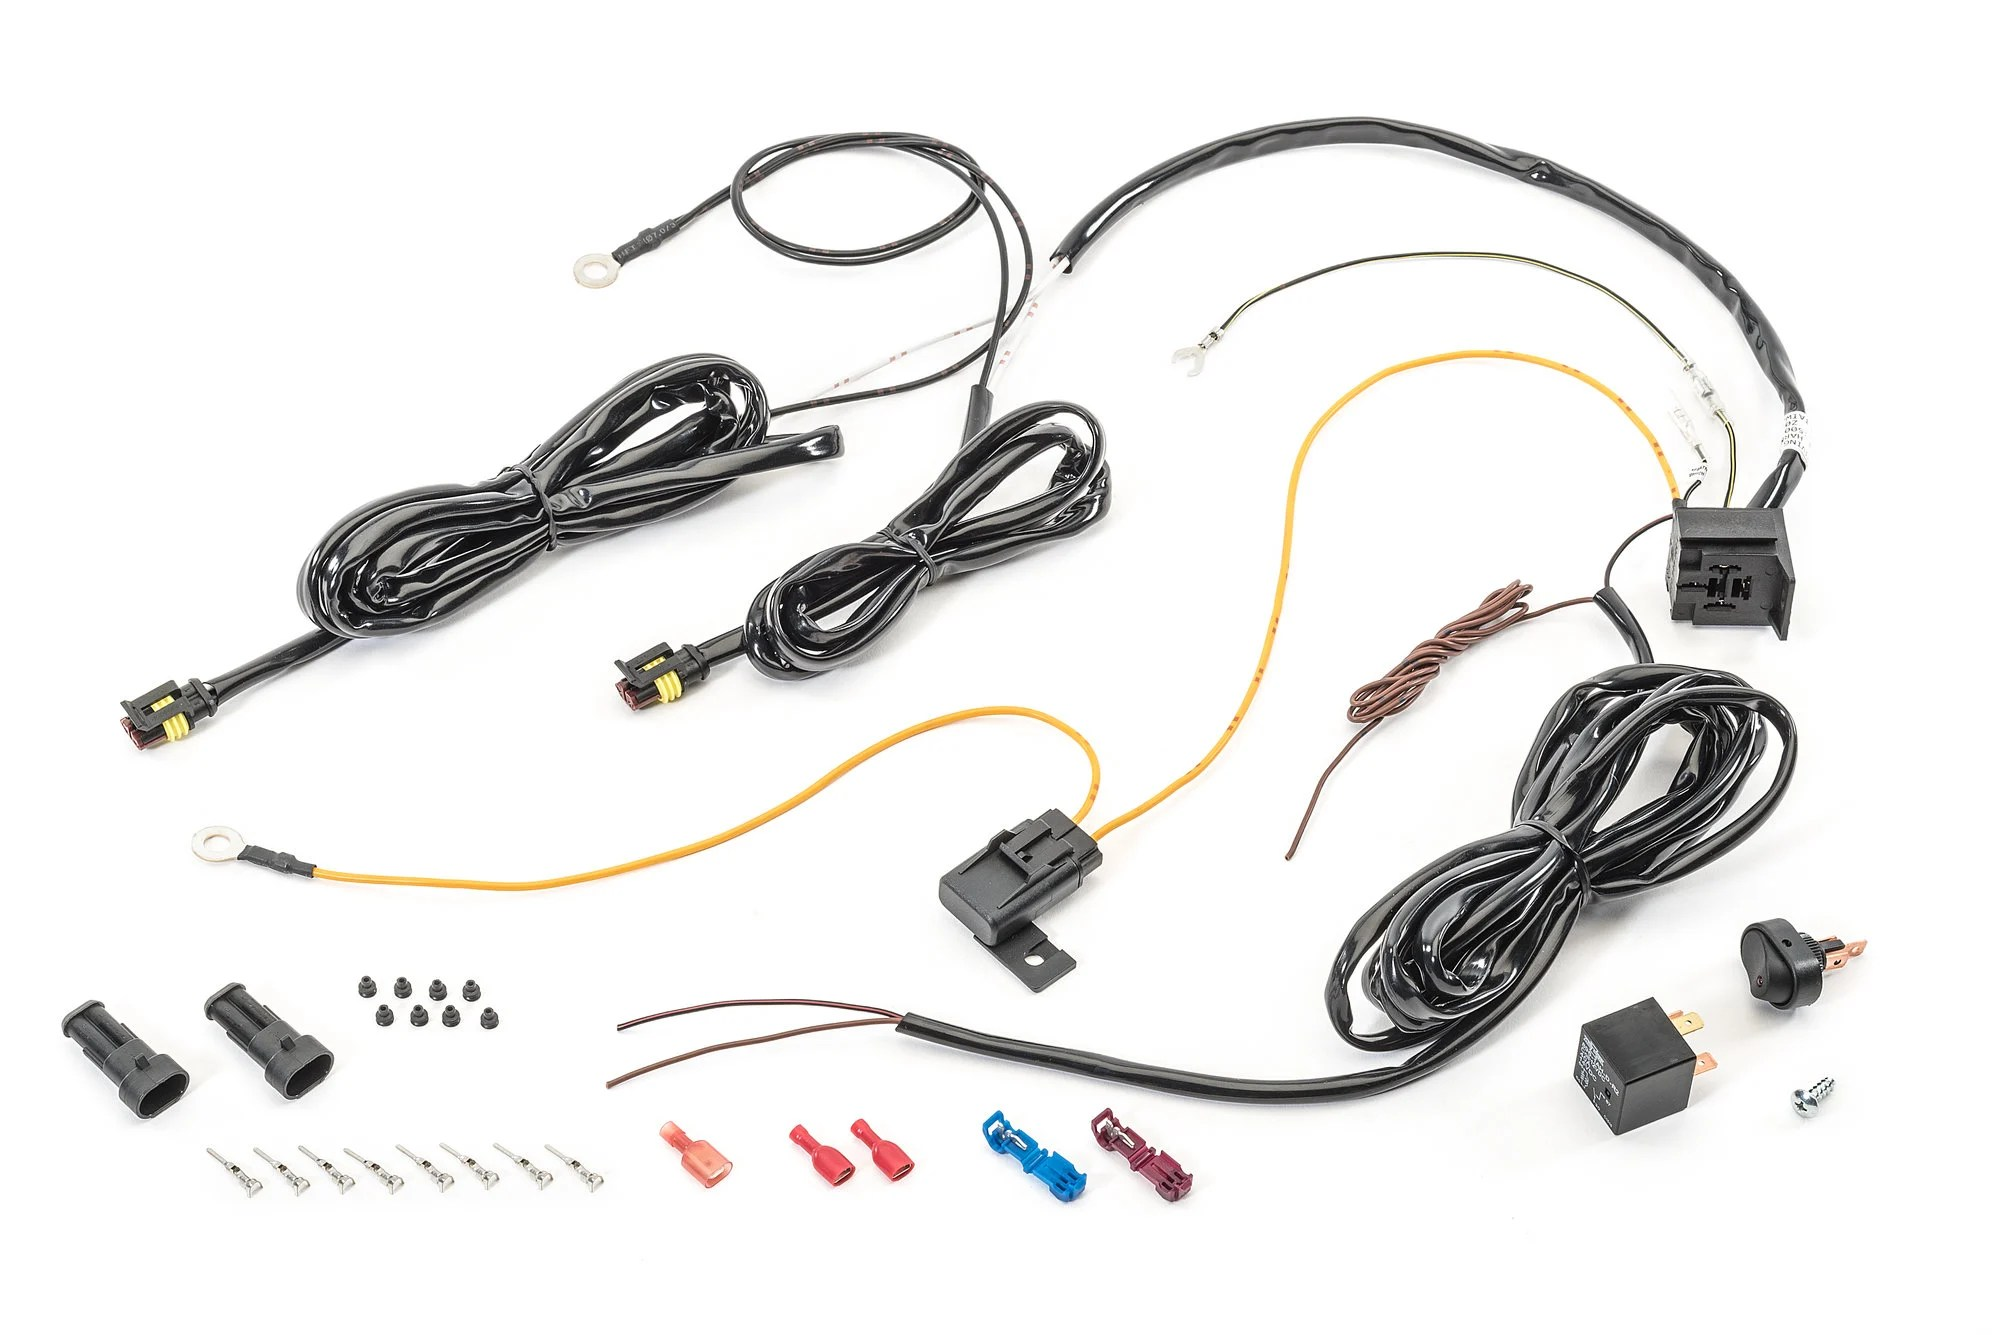 spotlight wiring diagram uk facial bones not labeled lightforce htx free download  oasis dl co